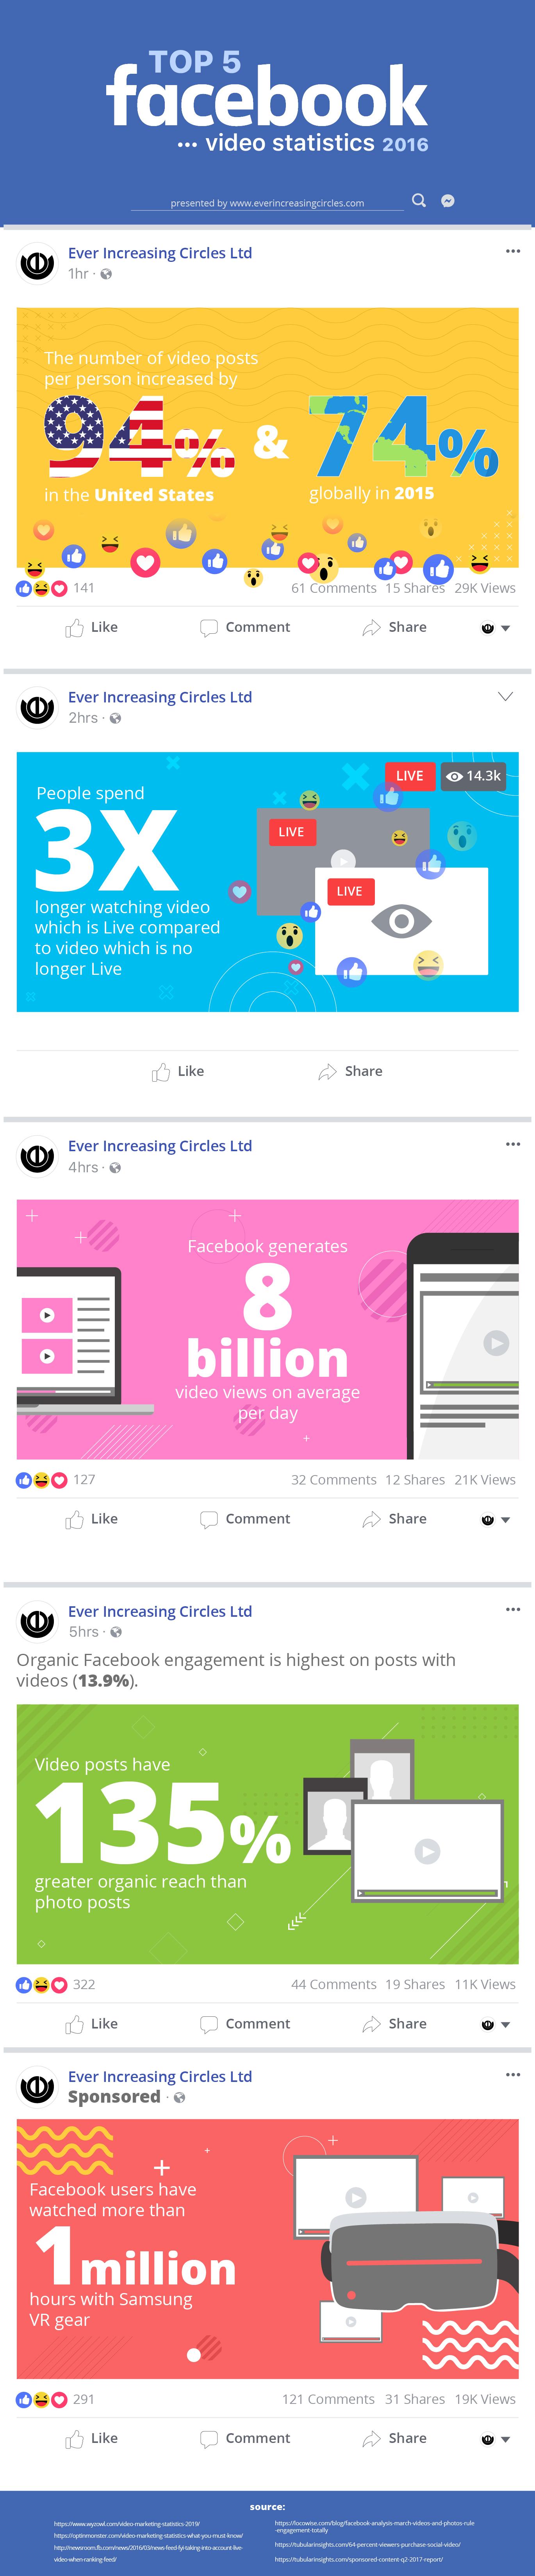 Top 5 Facebook Video Statistics 2016 Infographic